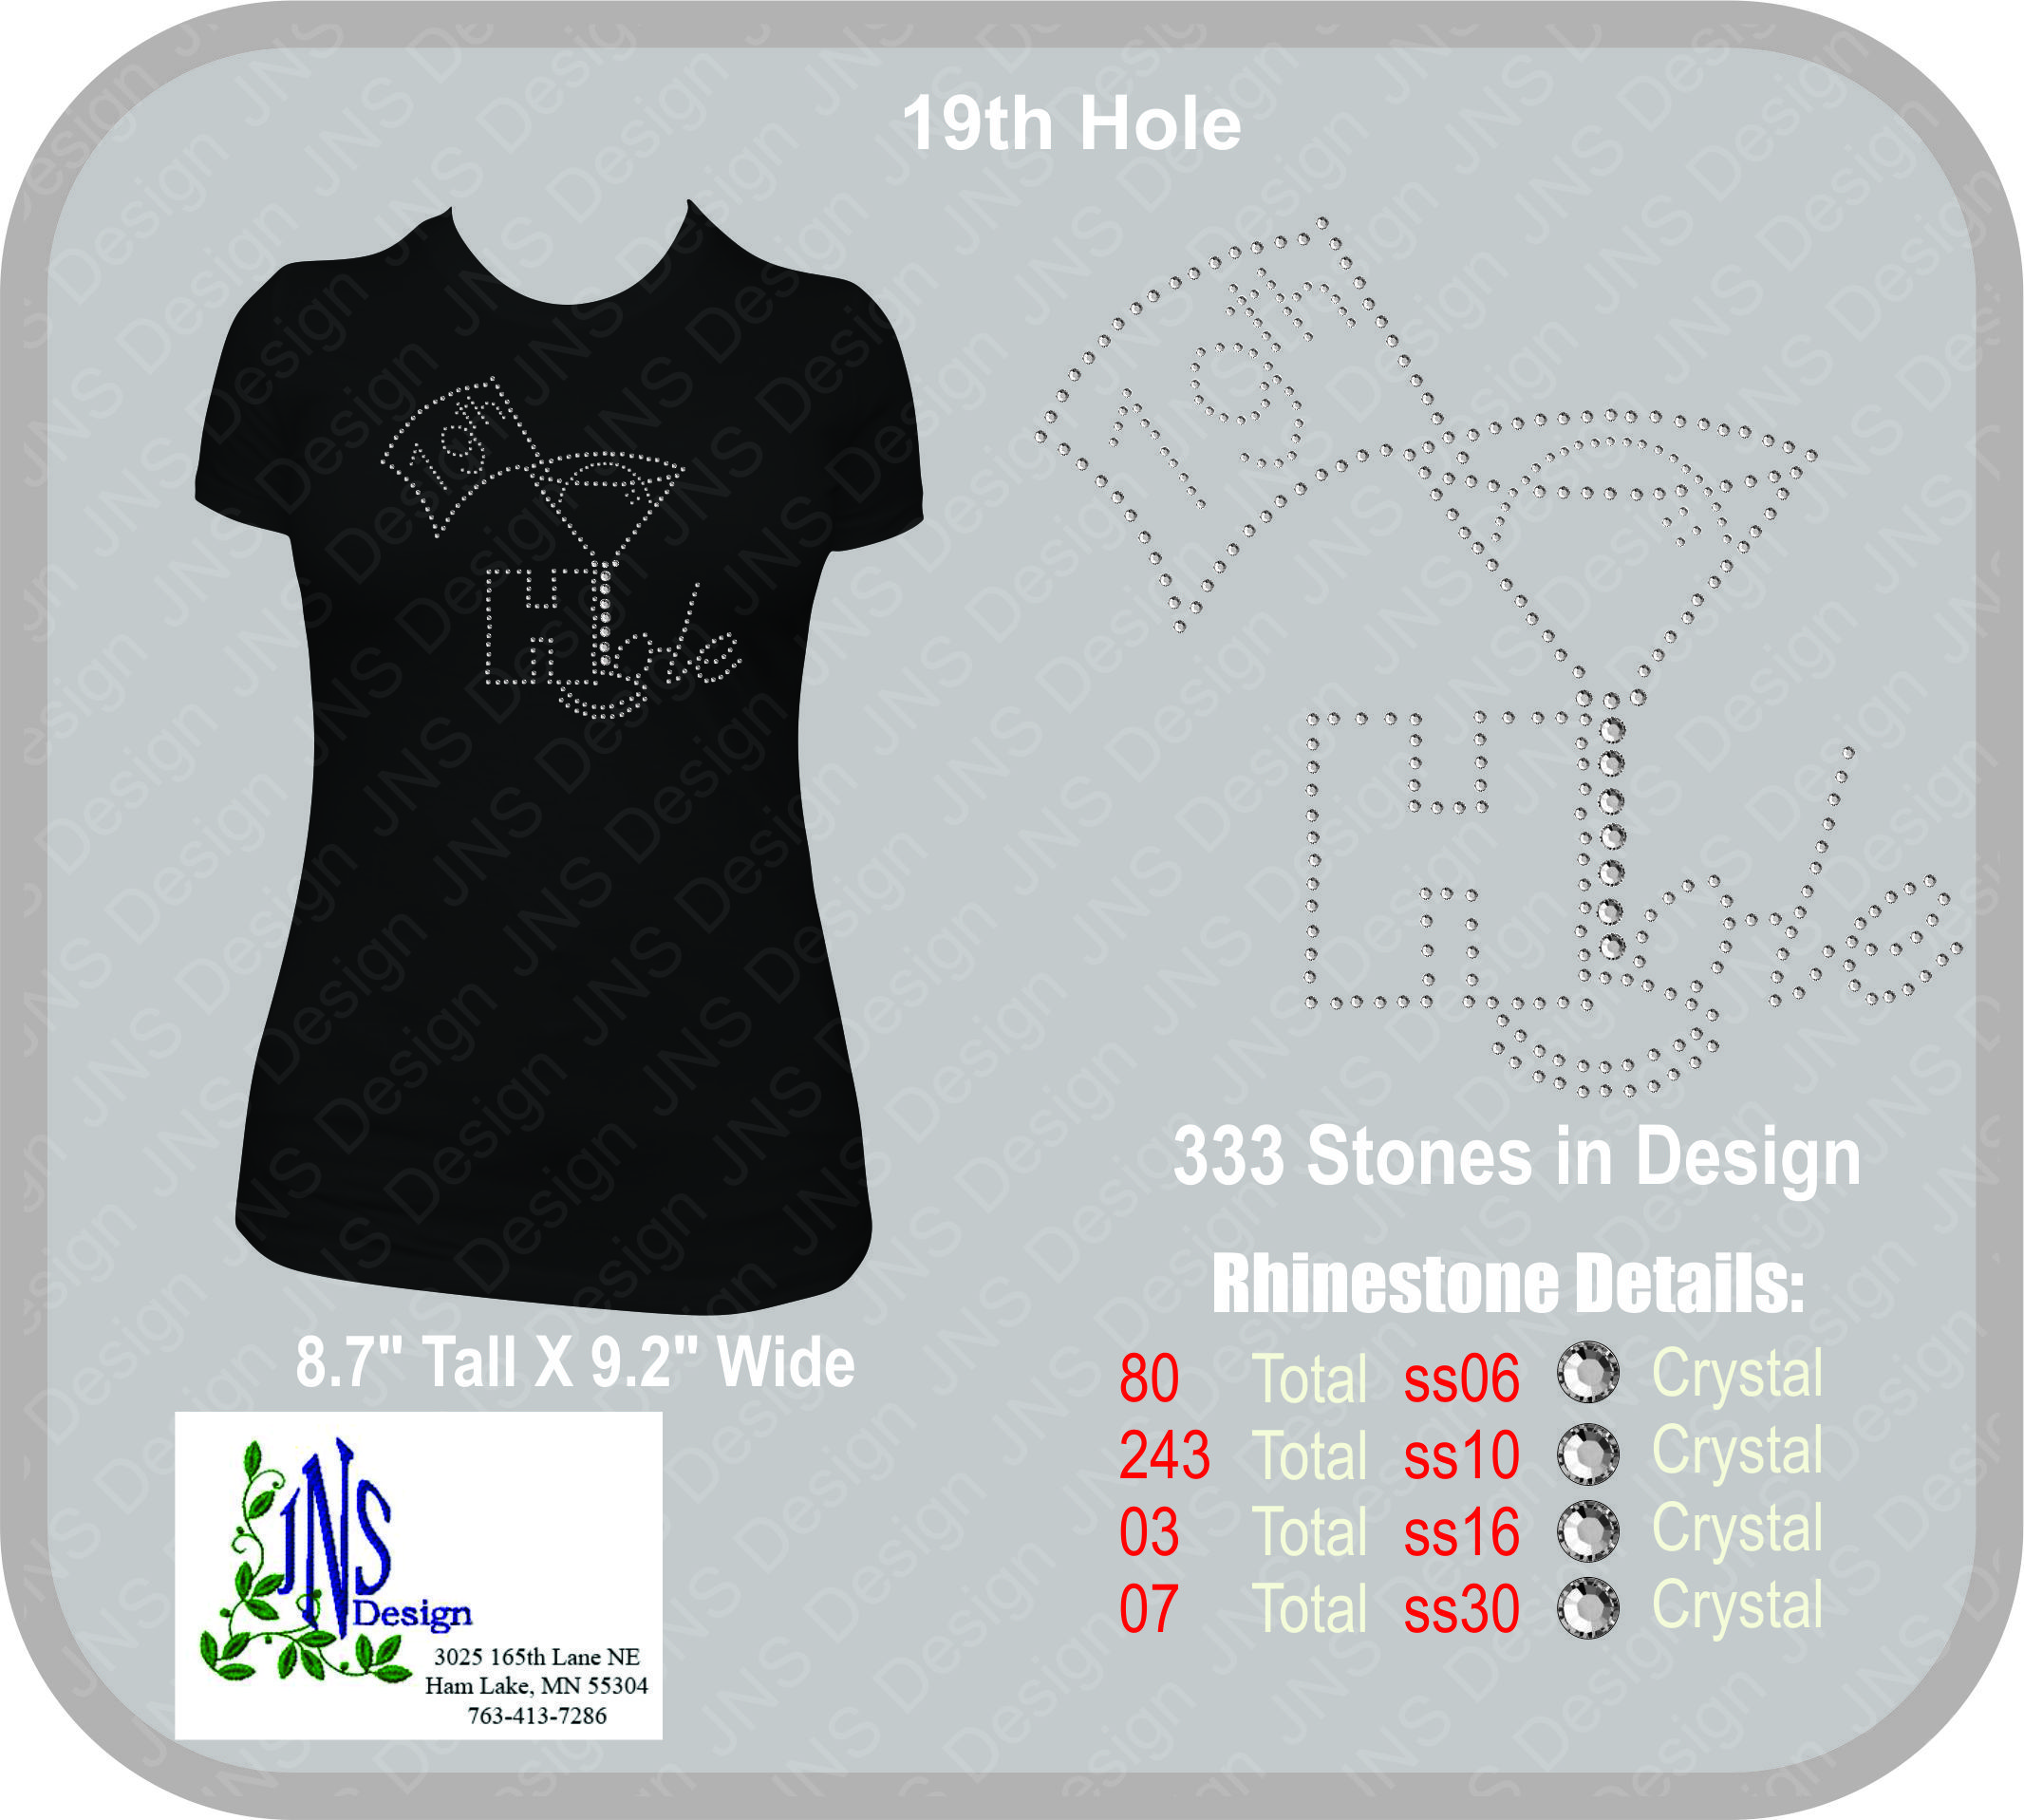 19th Hole Rhinestone T-Shirt